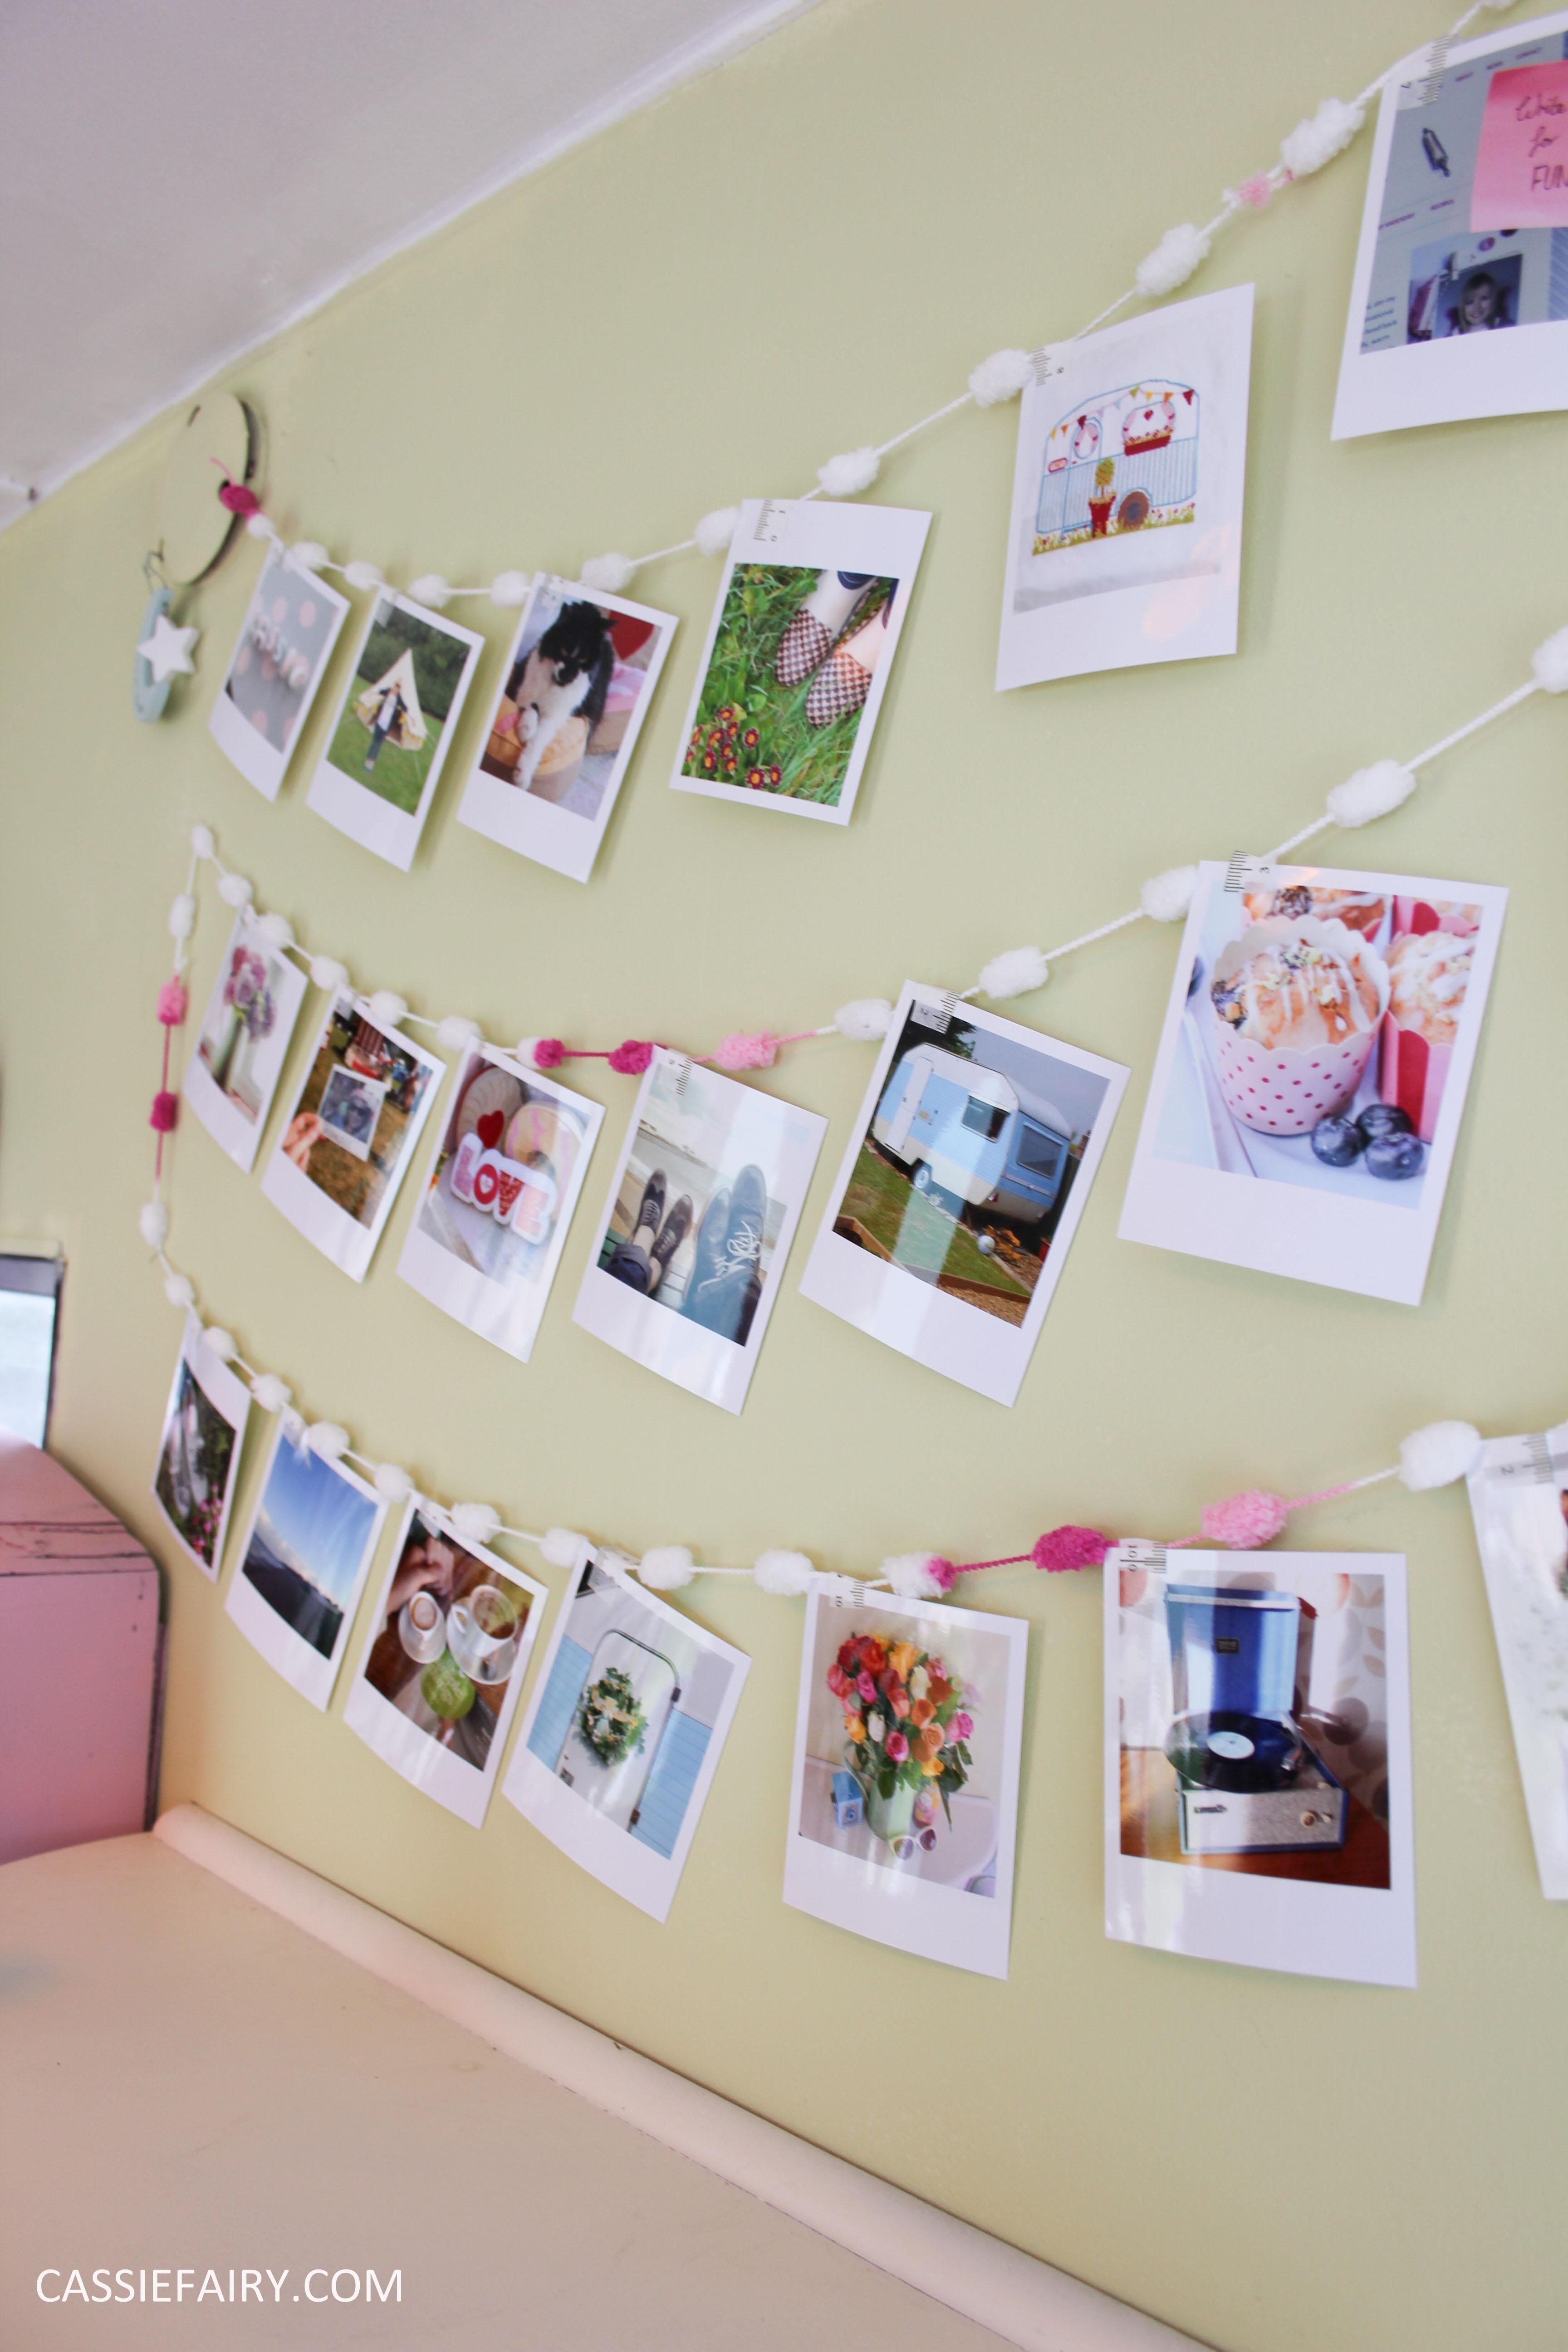 diy polariod photo wall display decoration using polabox-20